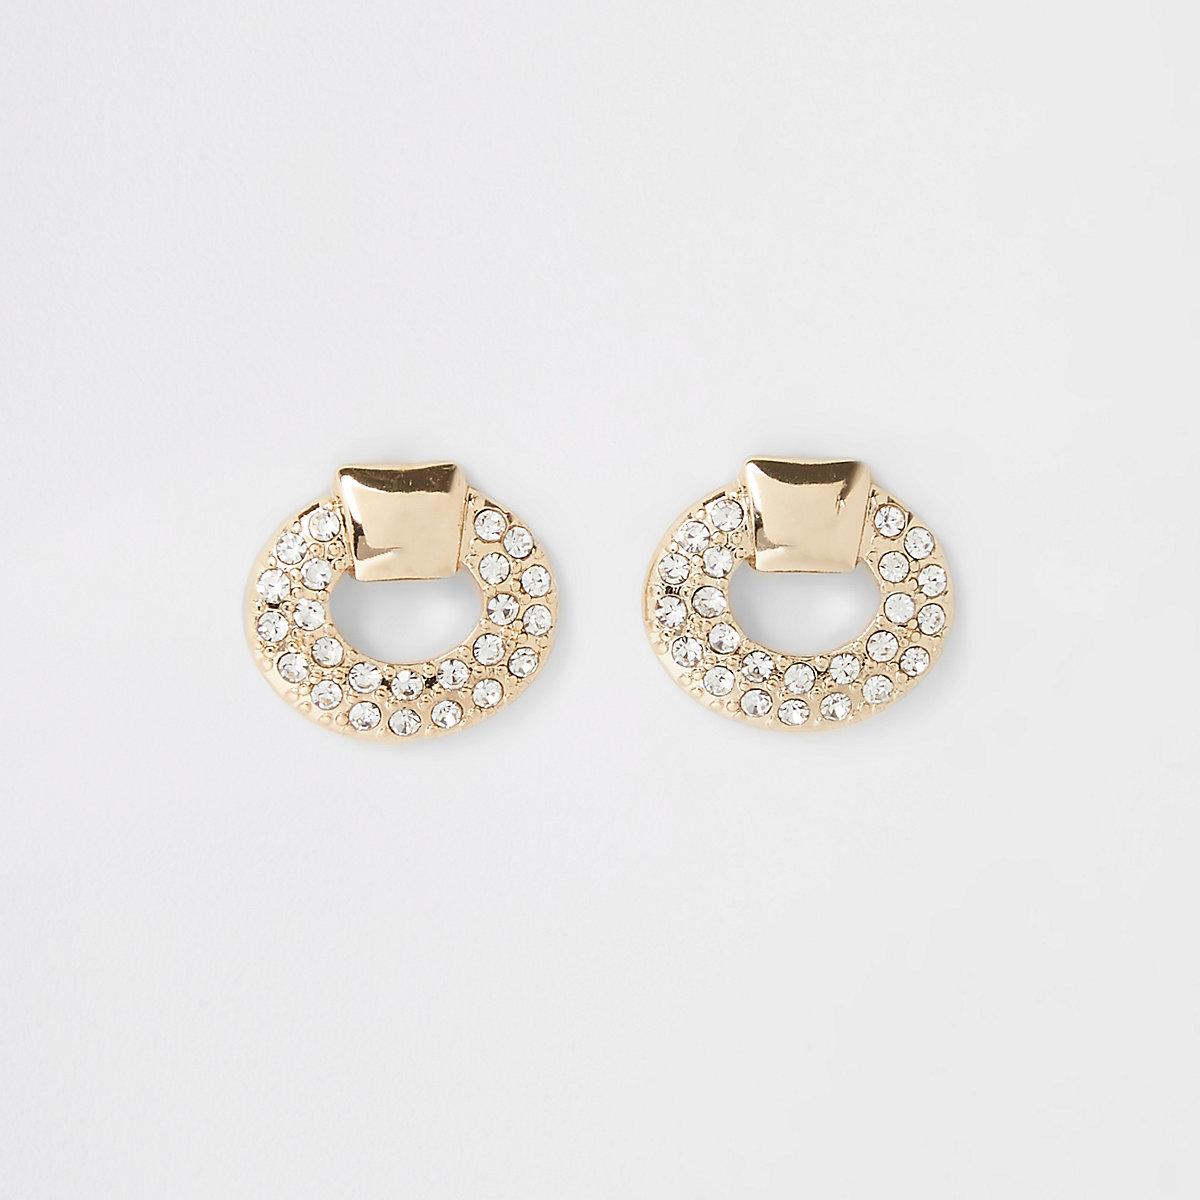 Gold tone diamante door knocker stud earrings